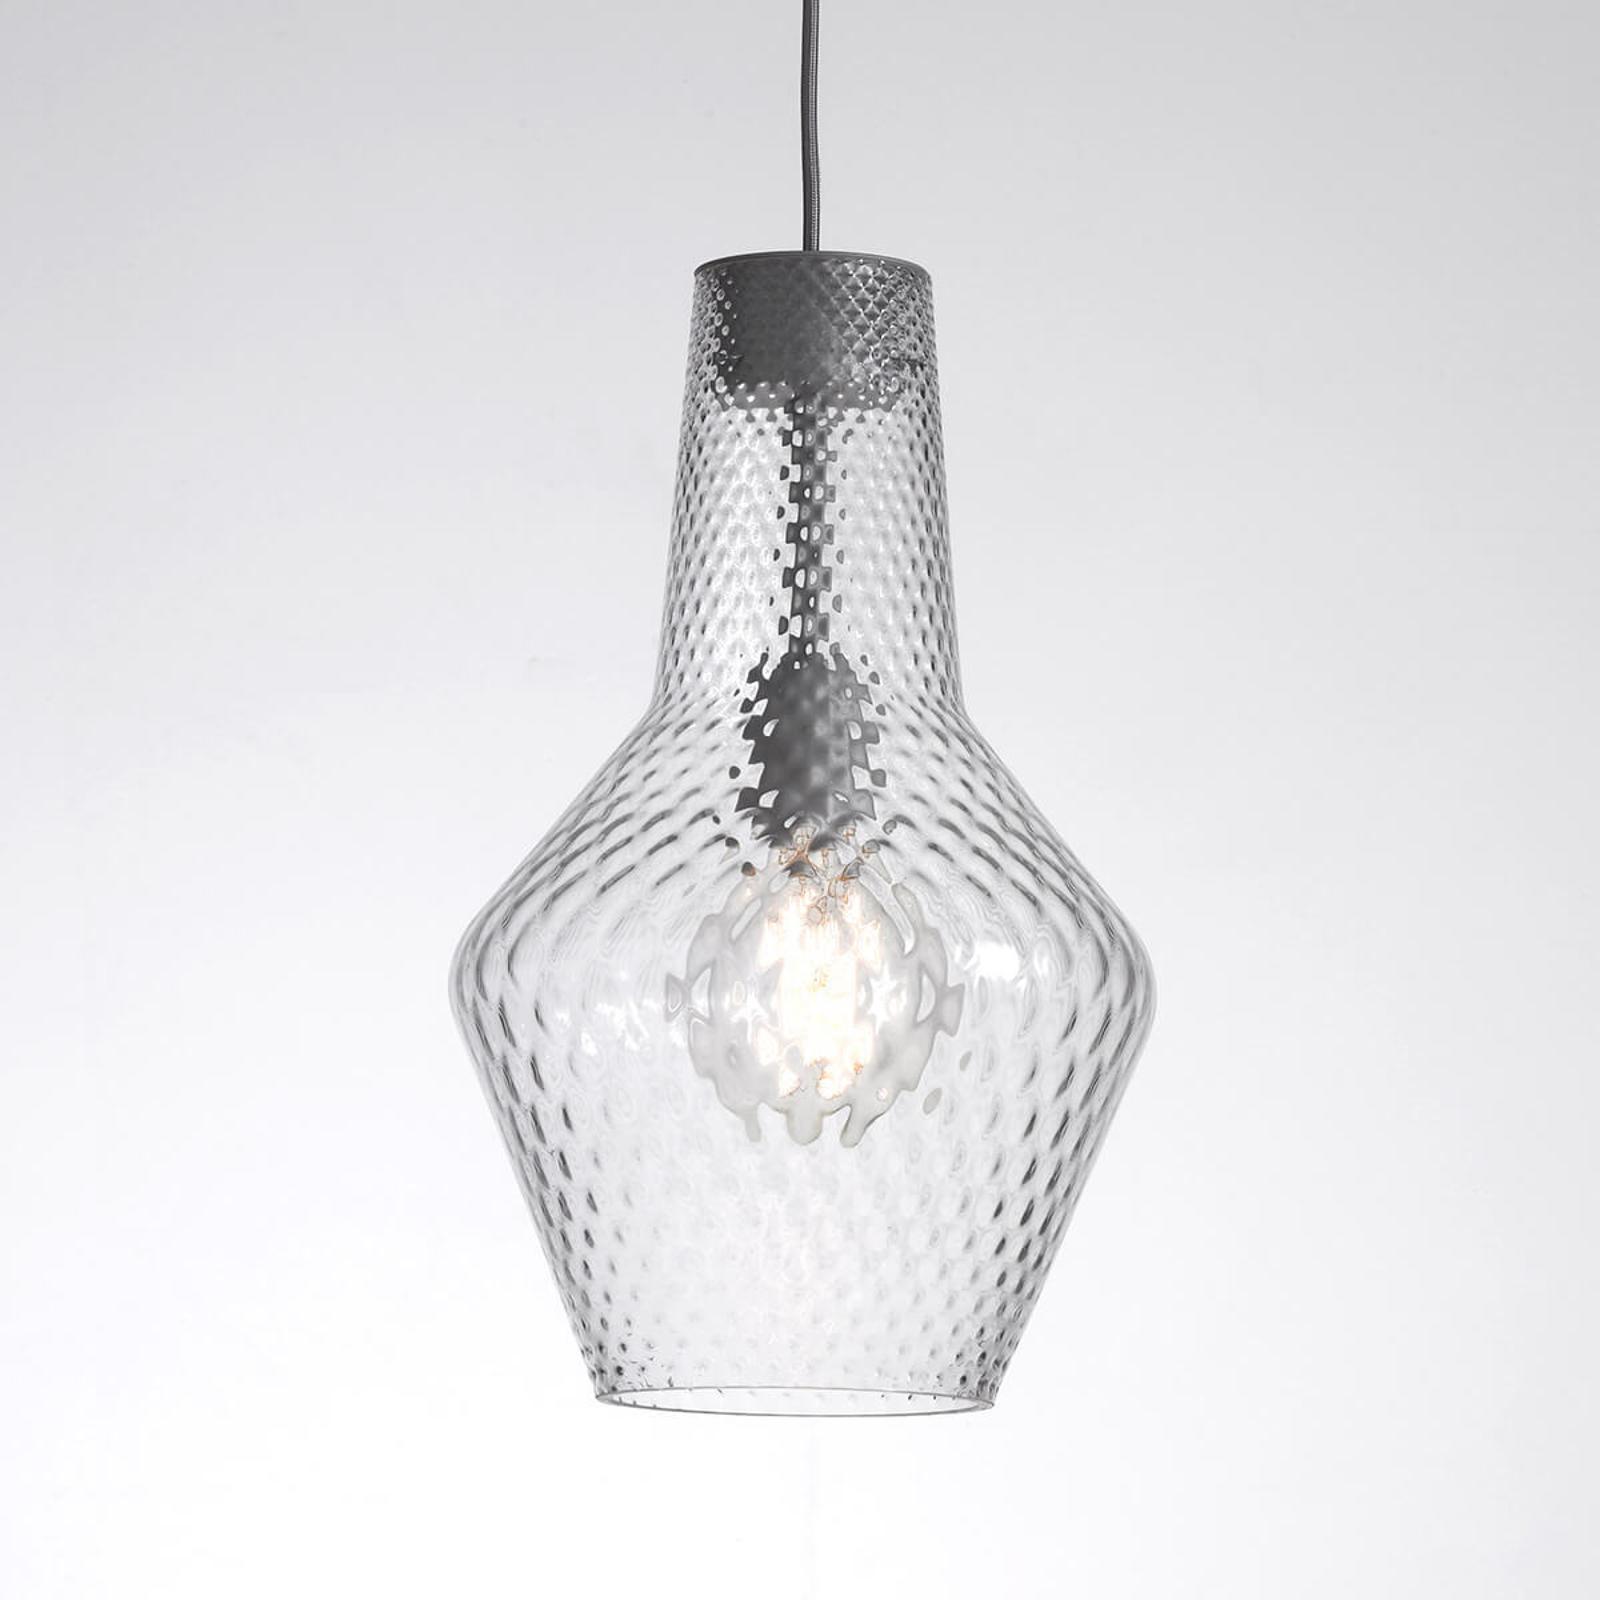 Hanglamp Romeo 130 cm, glas transparant